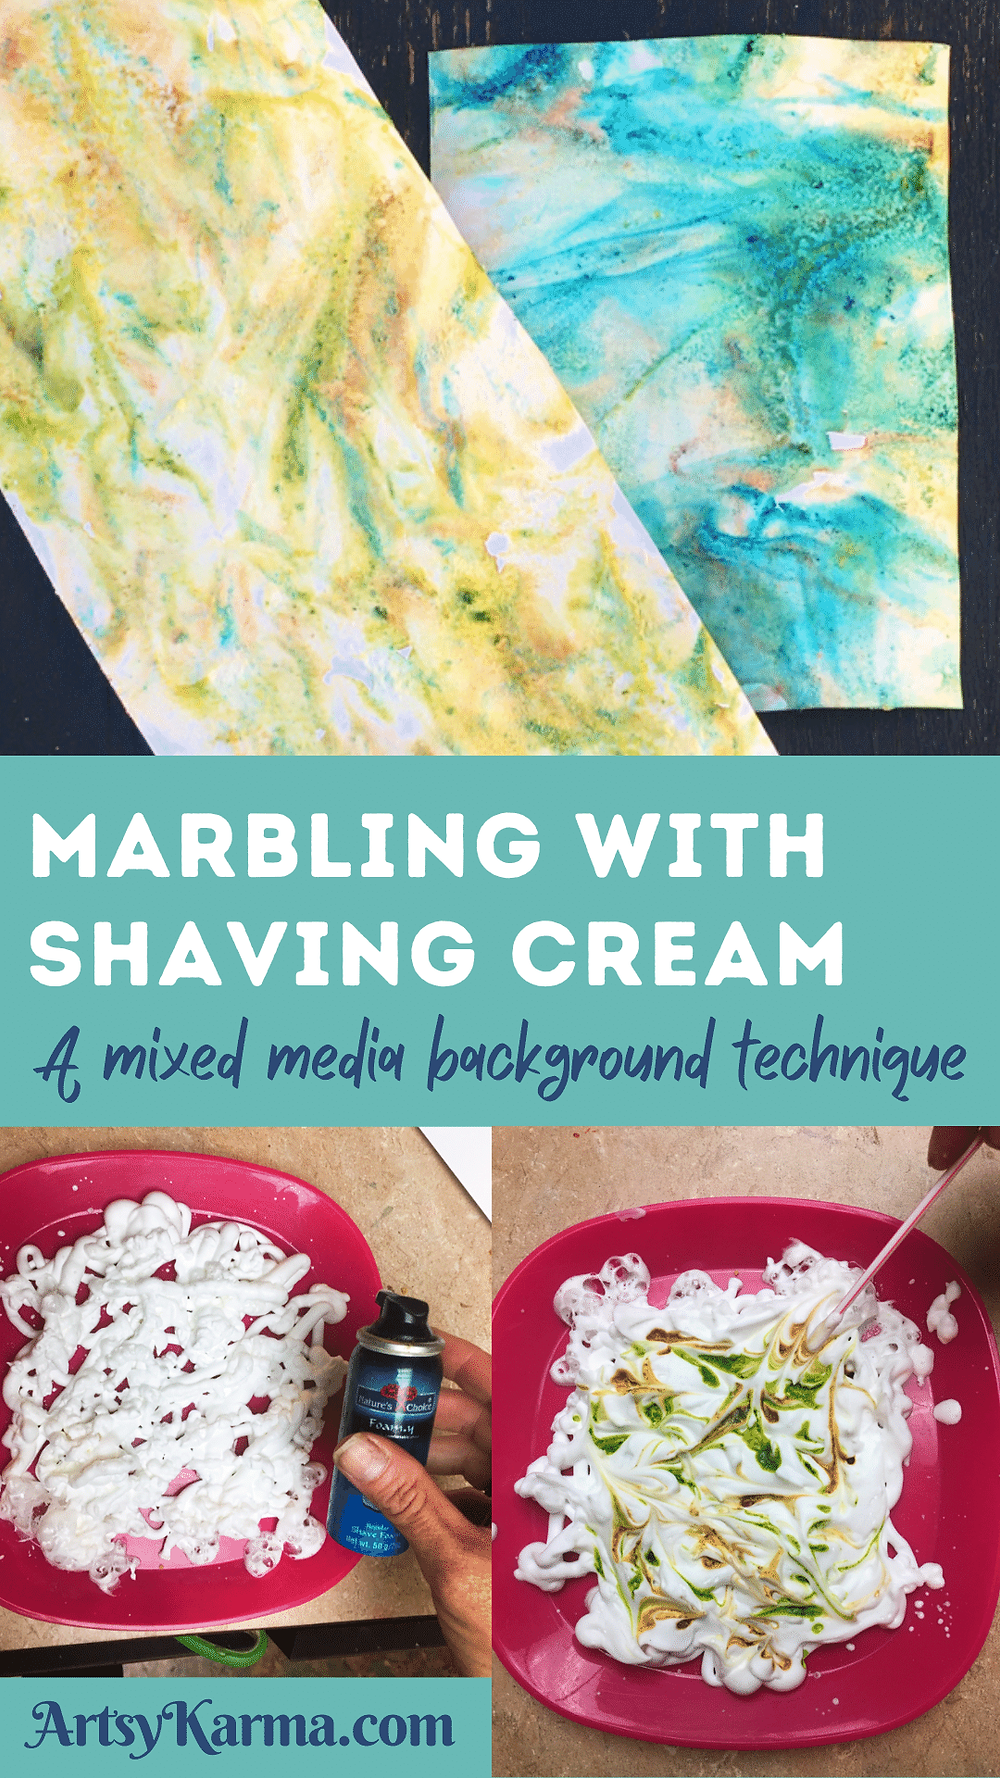 Marbling with shaving cream